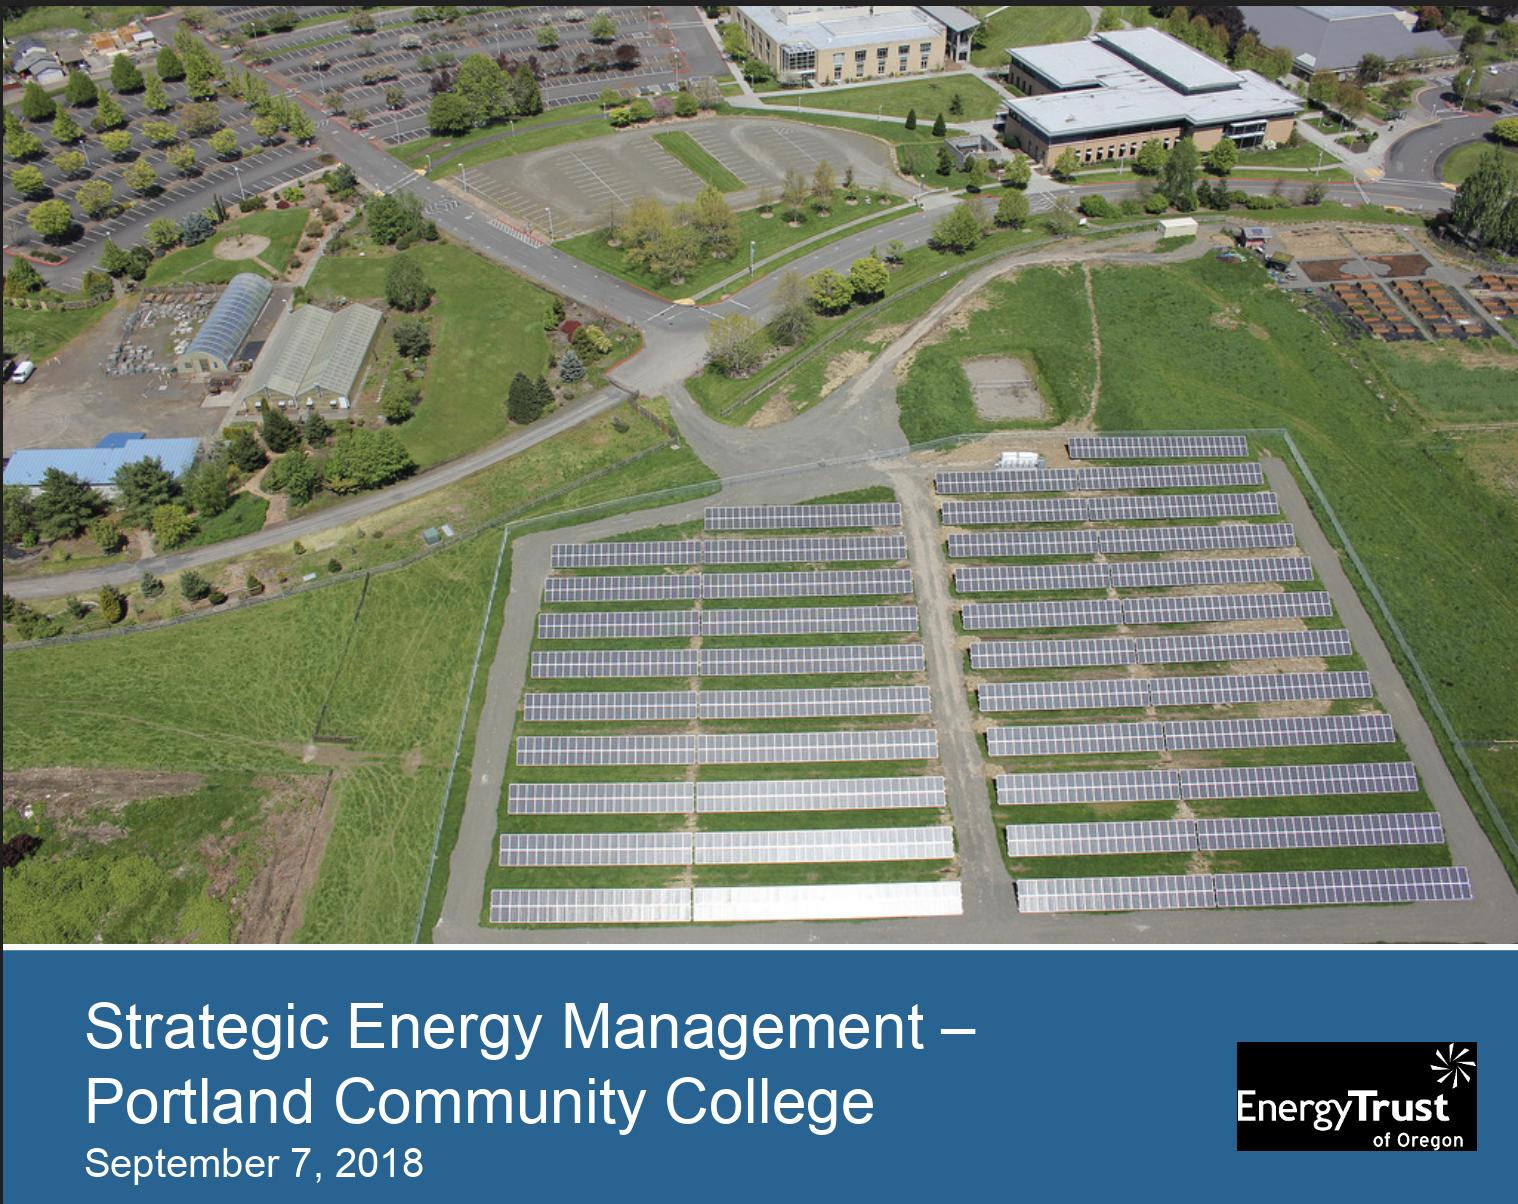 PCC's Strategic Energy Management presentation